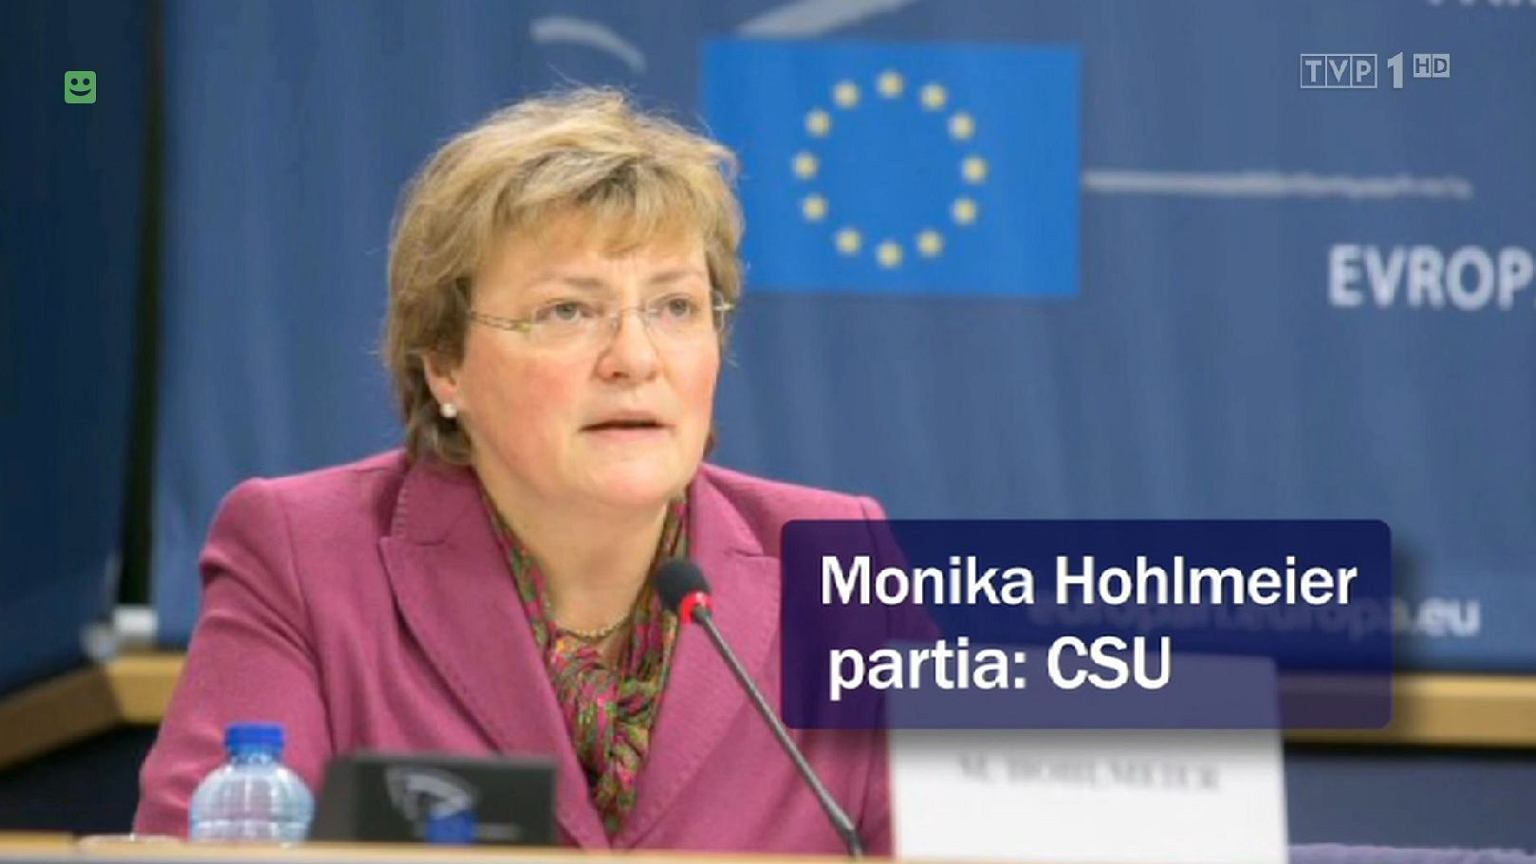 Monika, hohlmeier - Wikipedia